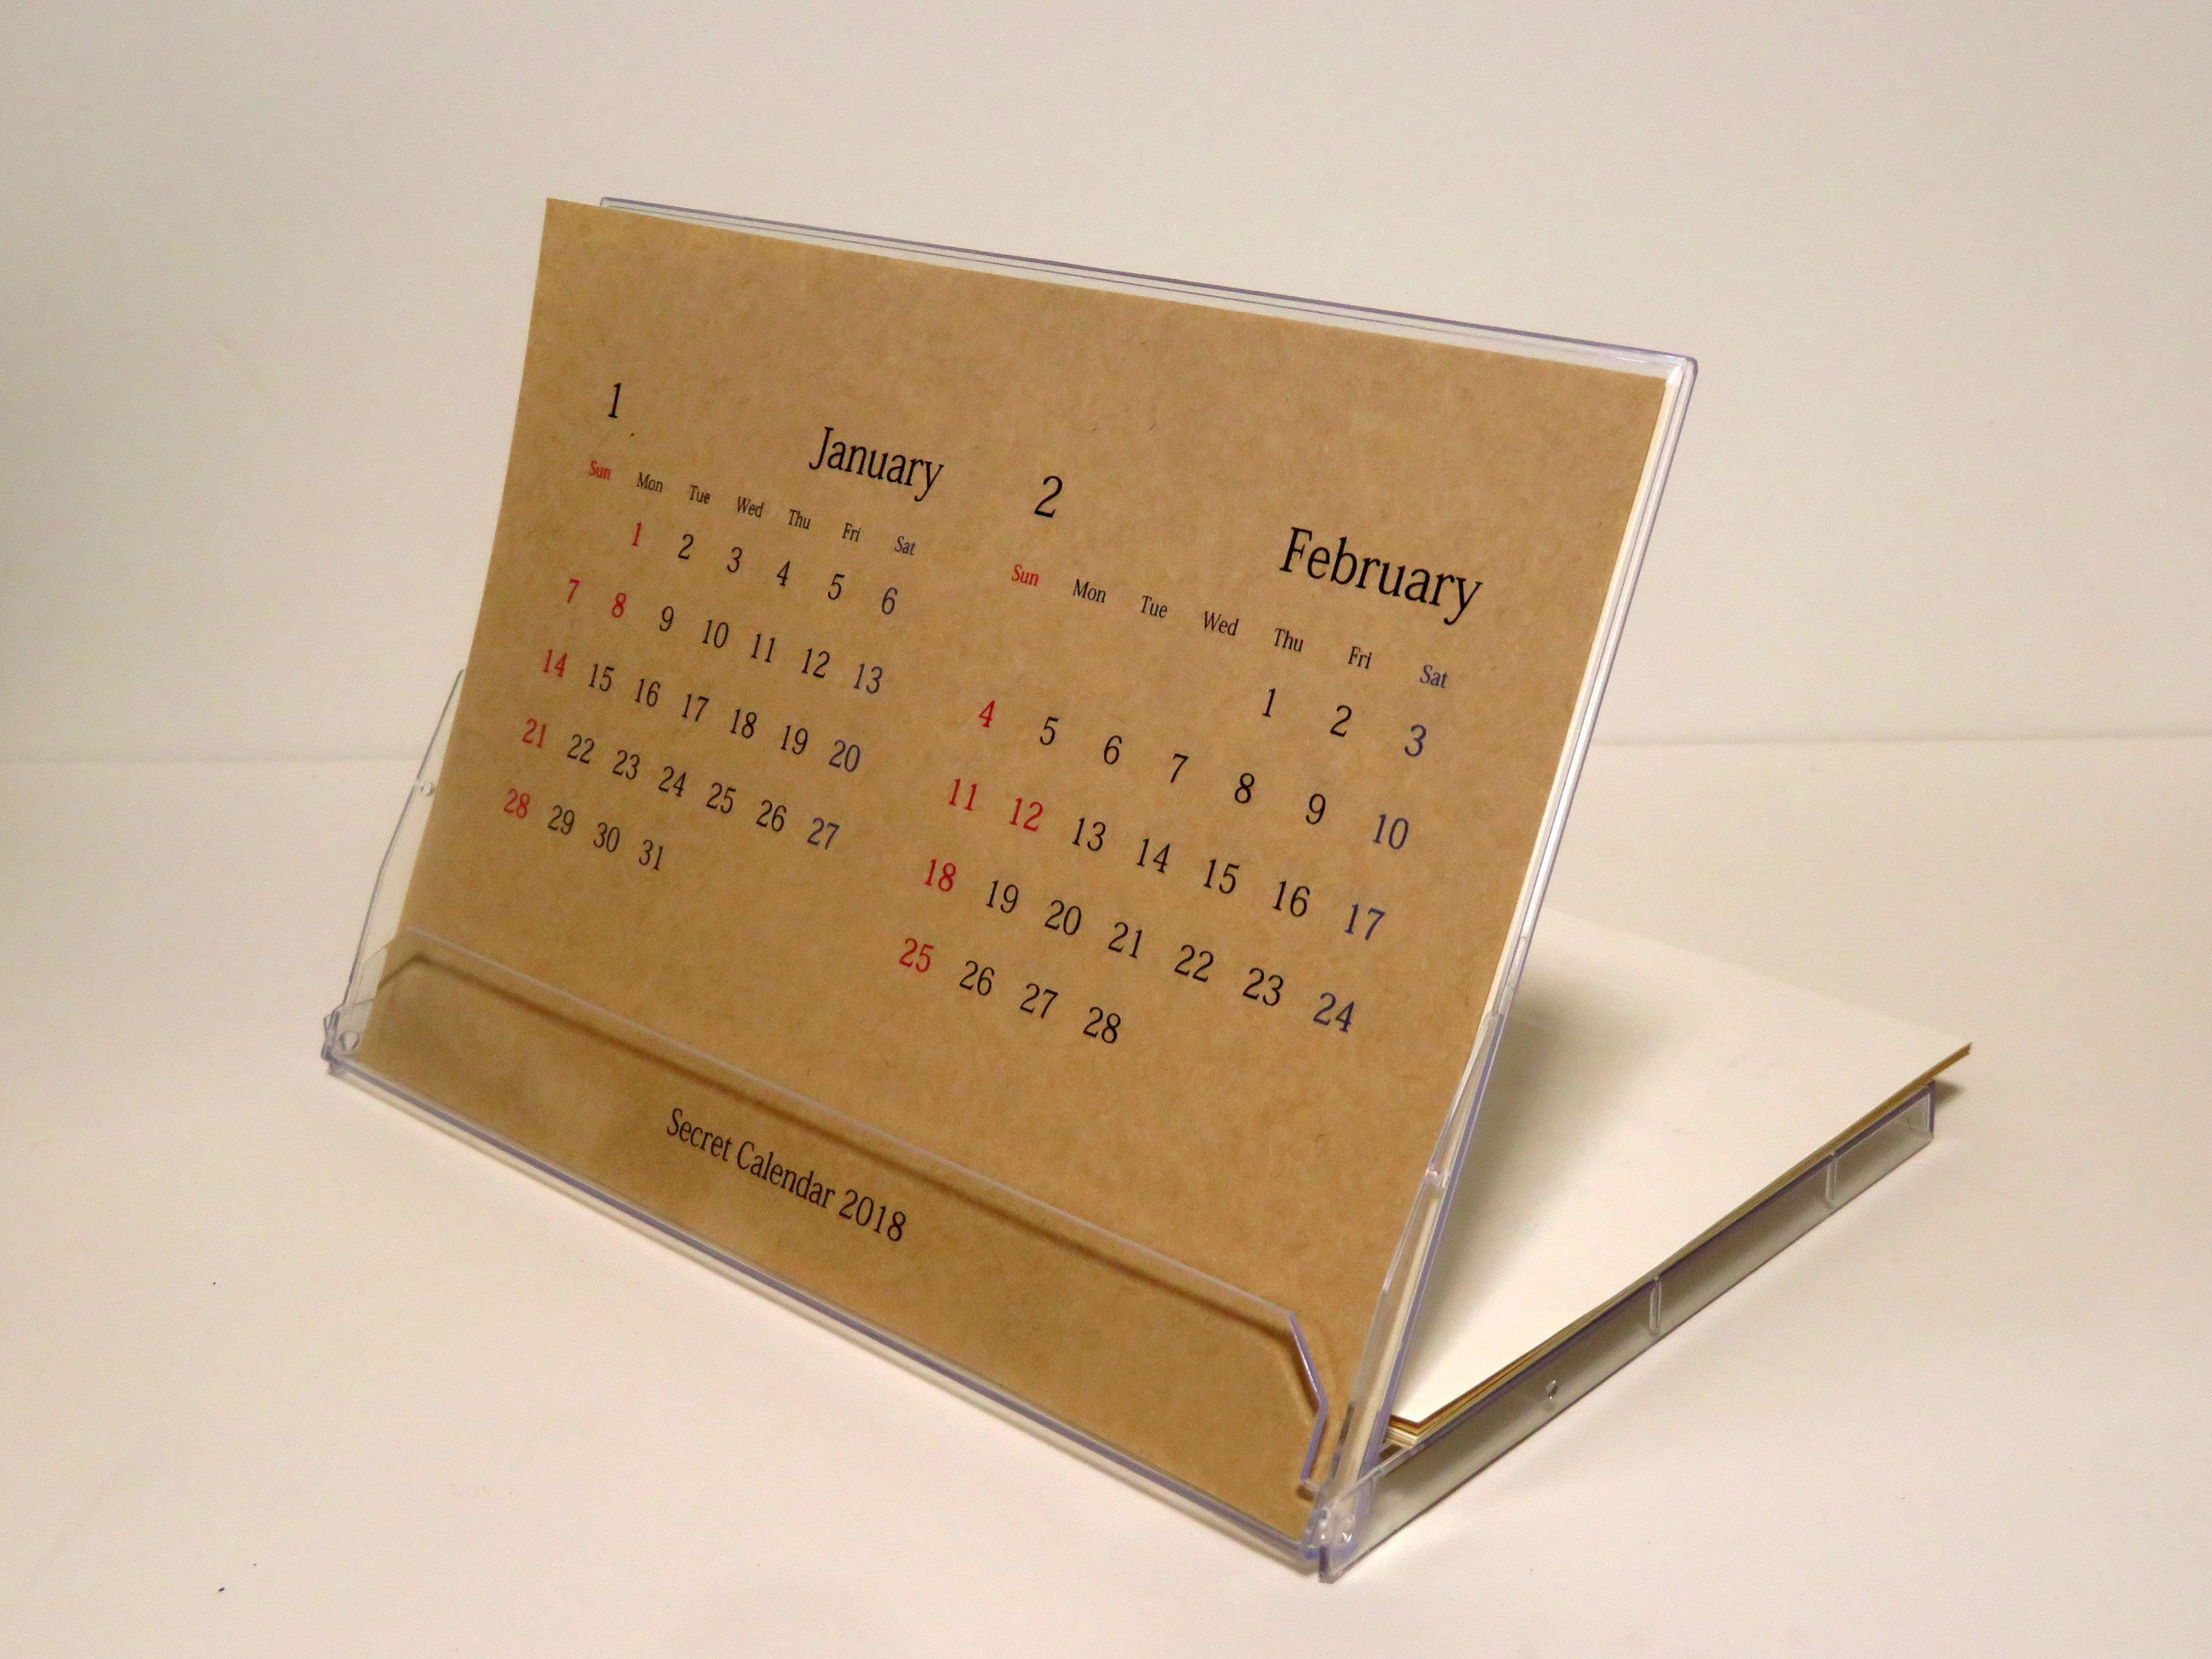 「Secret Calendar 2018」